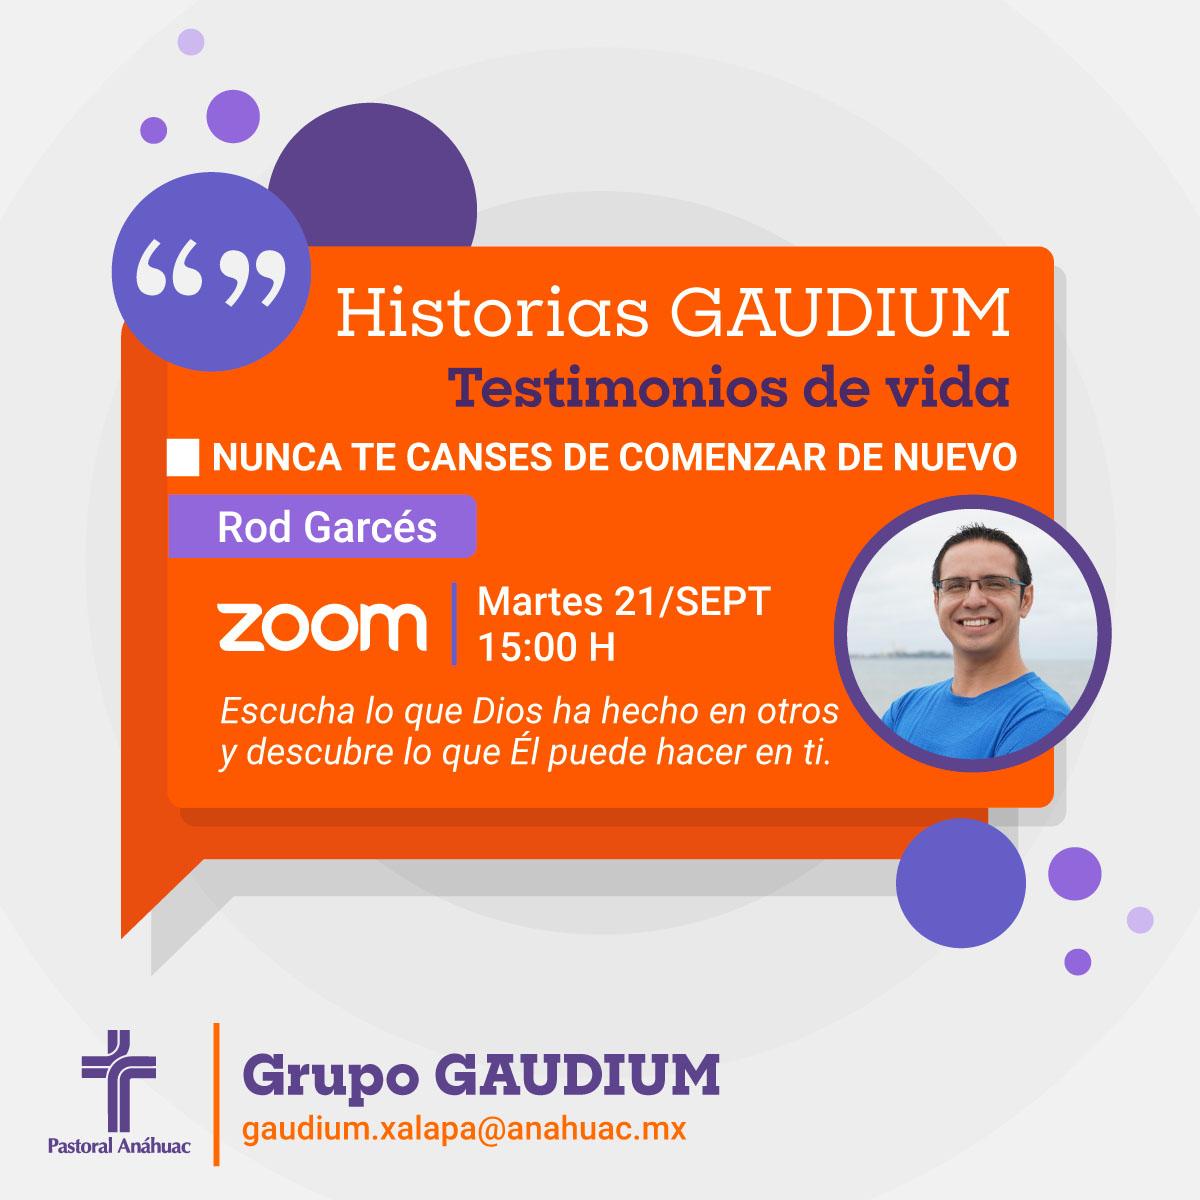 Historias Gaudium: Testimonios de Vida